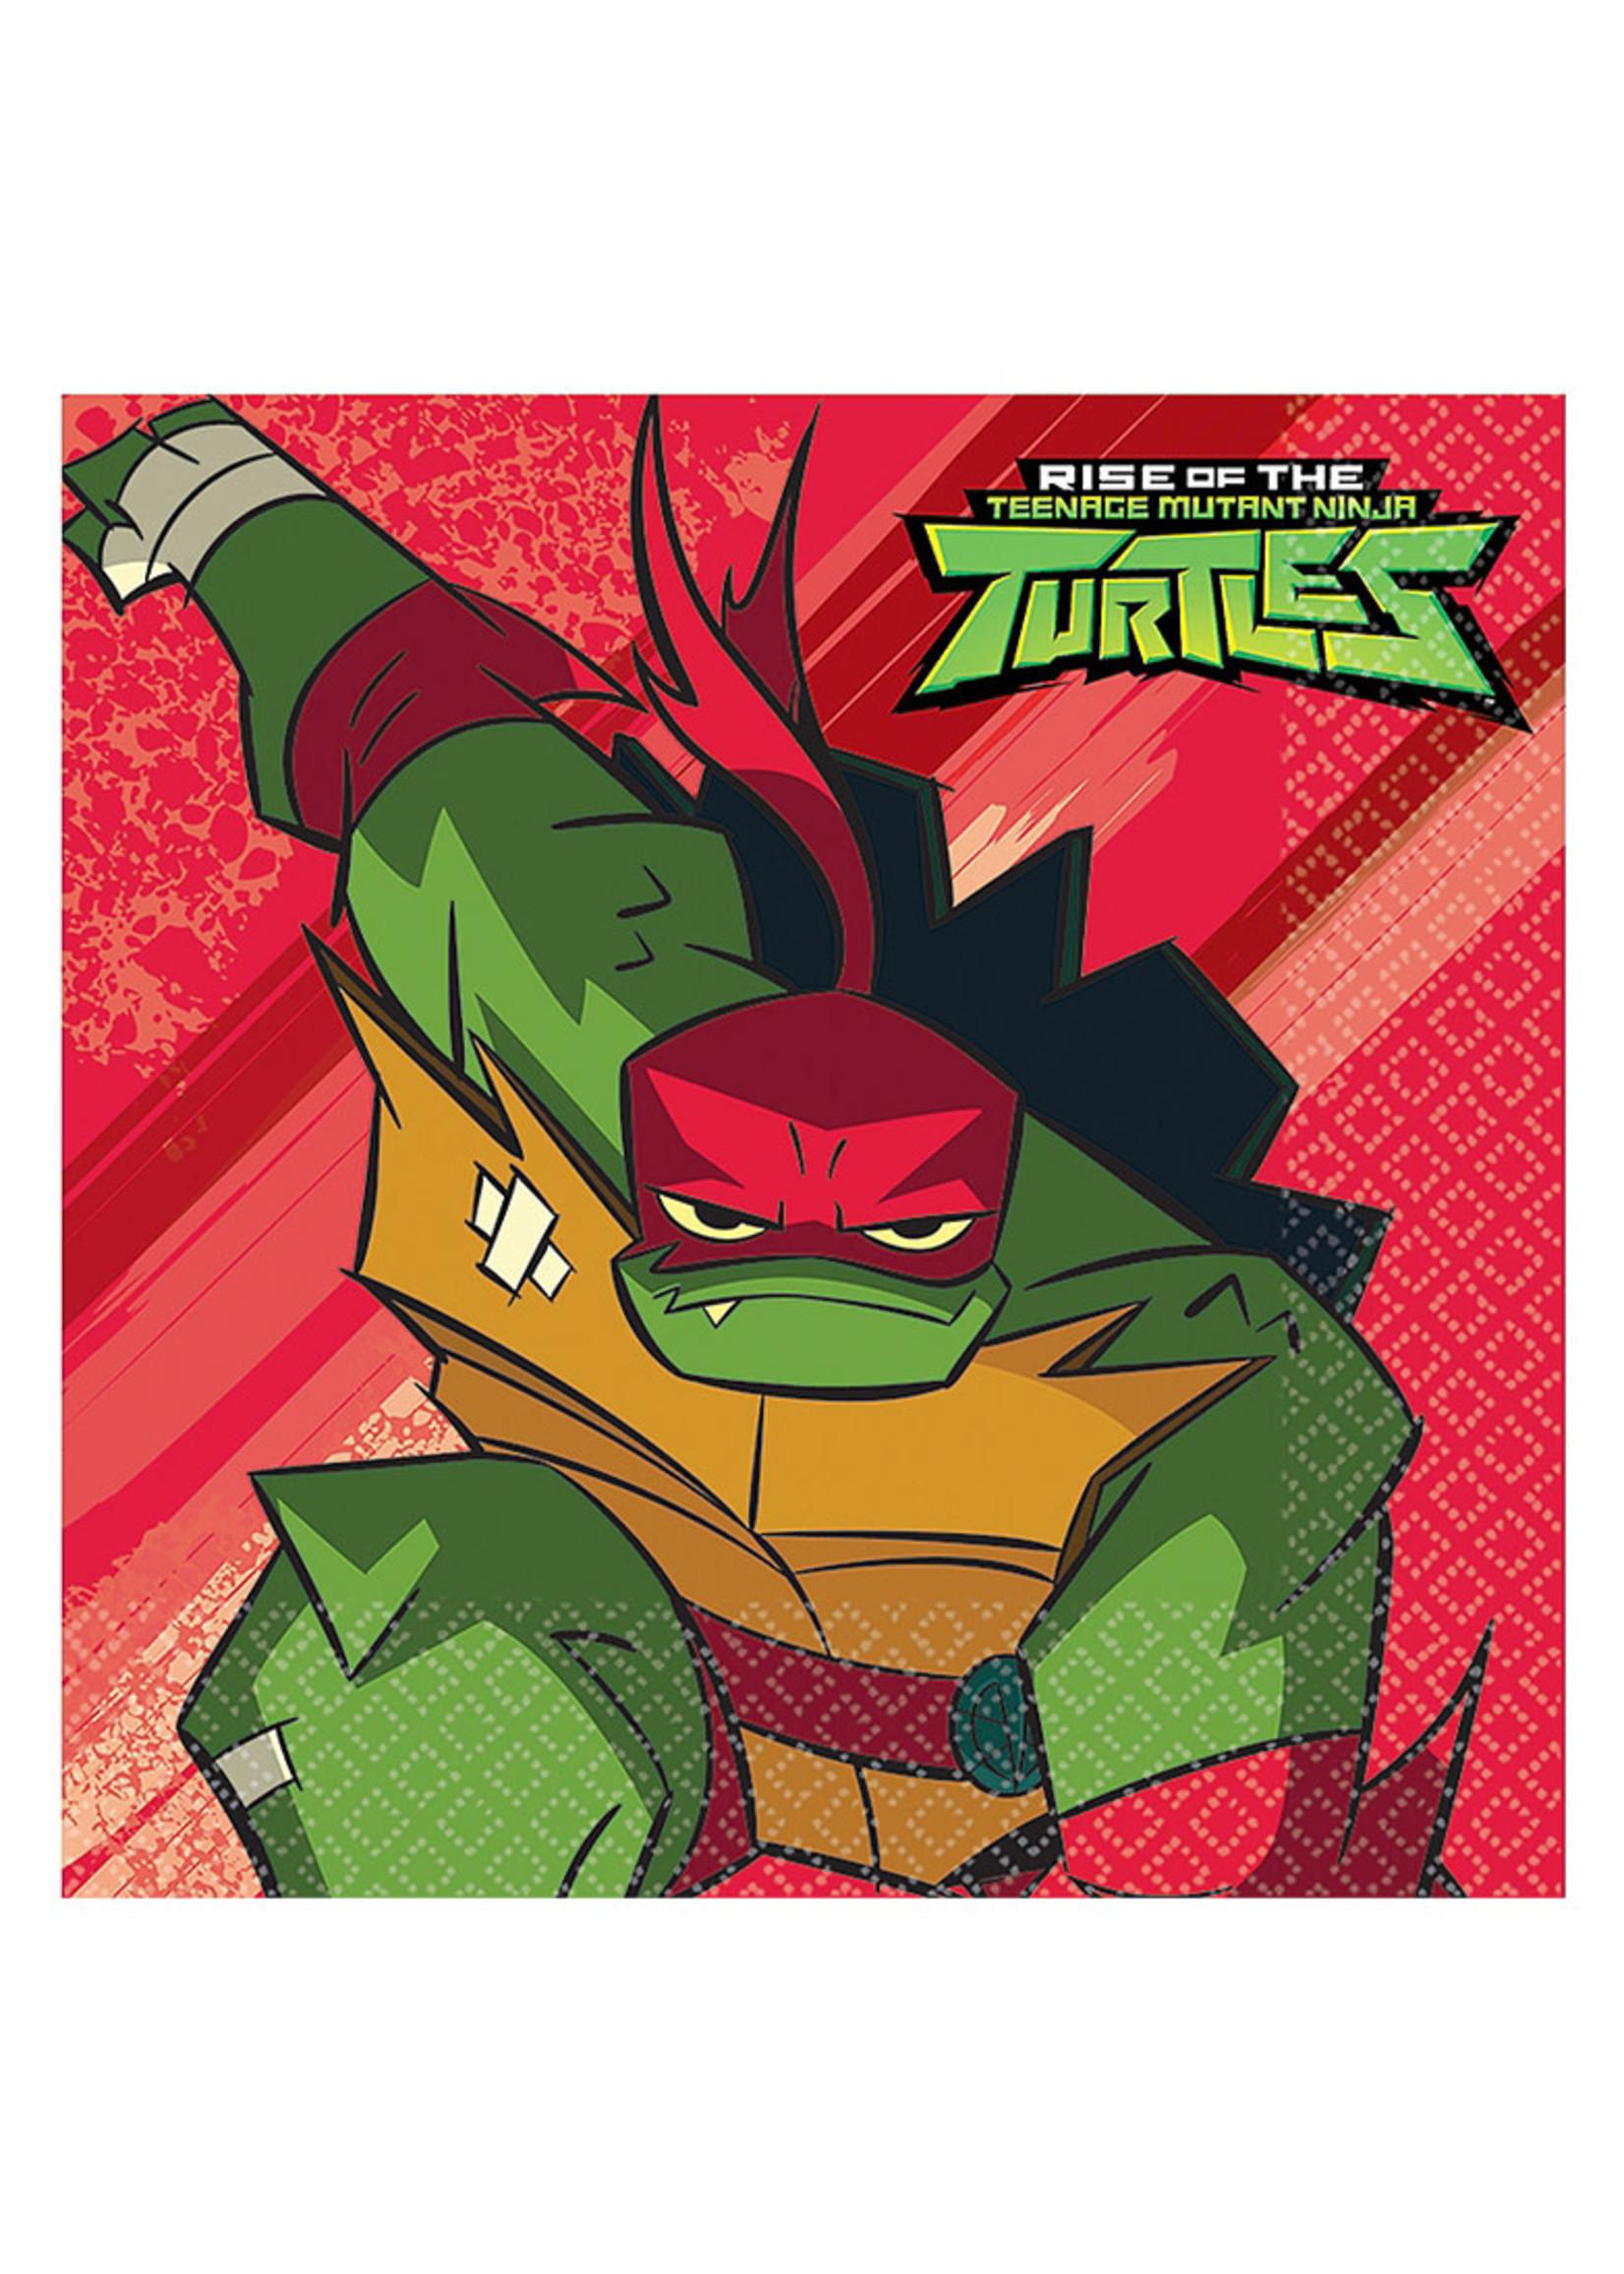 Rise of the Teenage Mutant Ninja Turtles Lunch Napkins 16ct